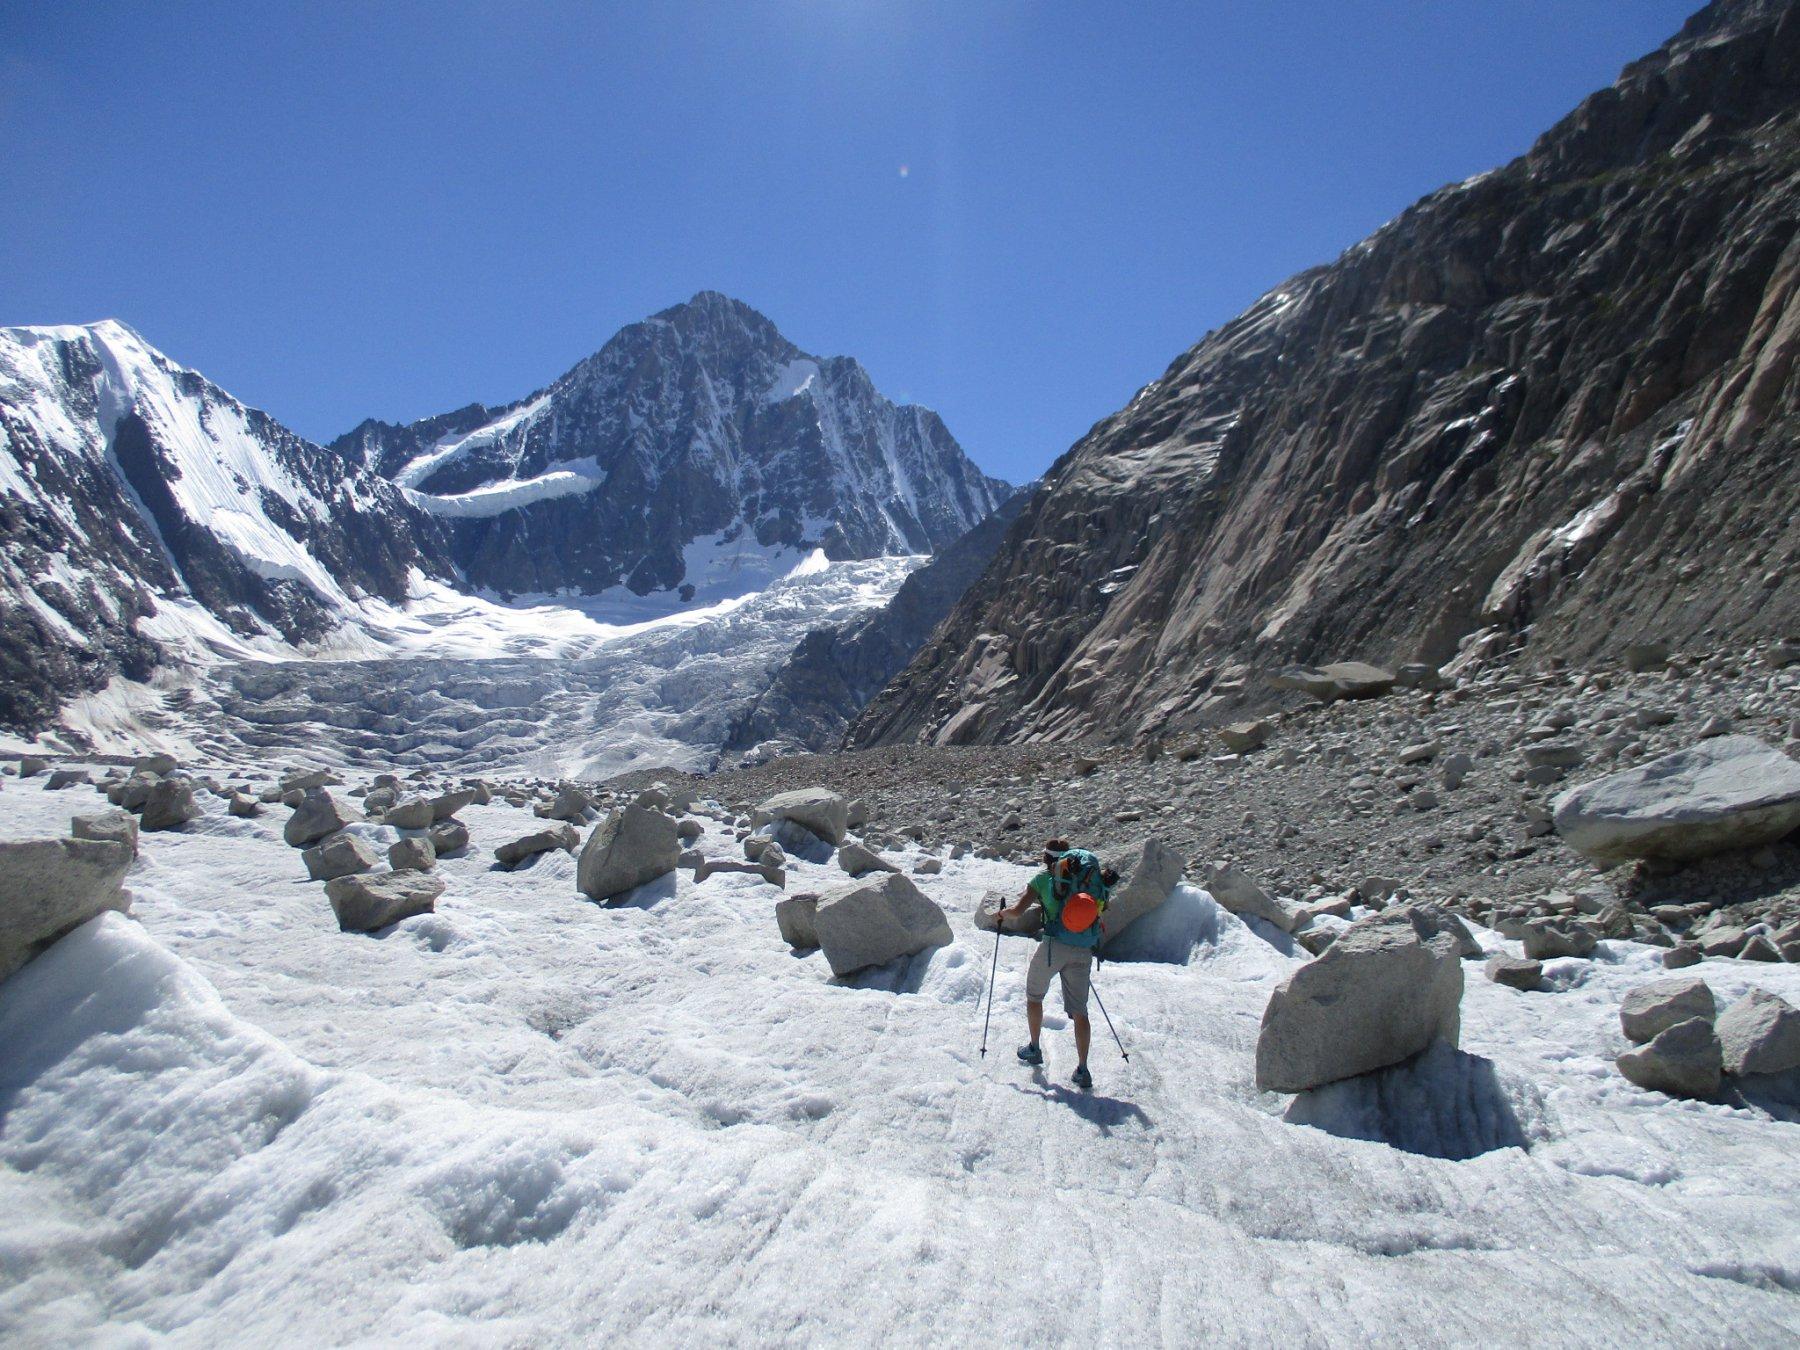 …sul ghiacciaio in compagnia del Finsteraarhorn...